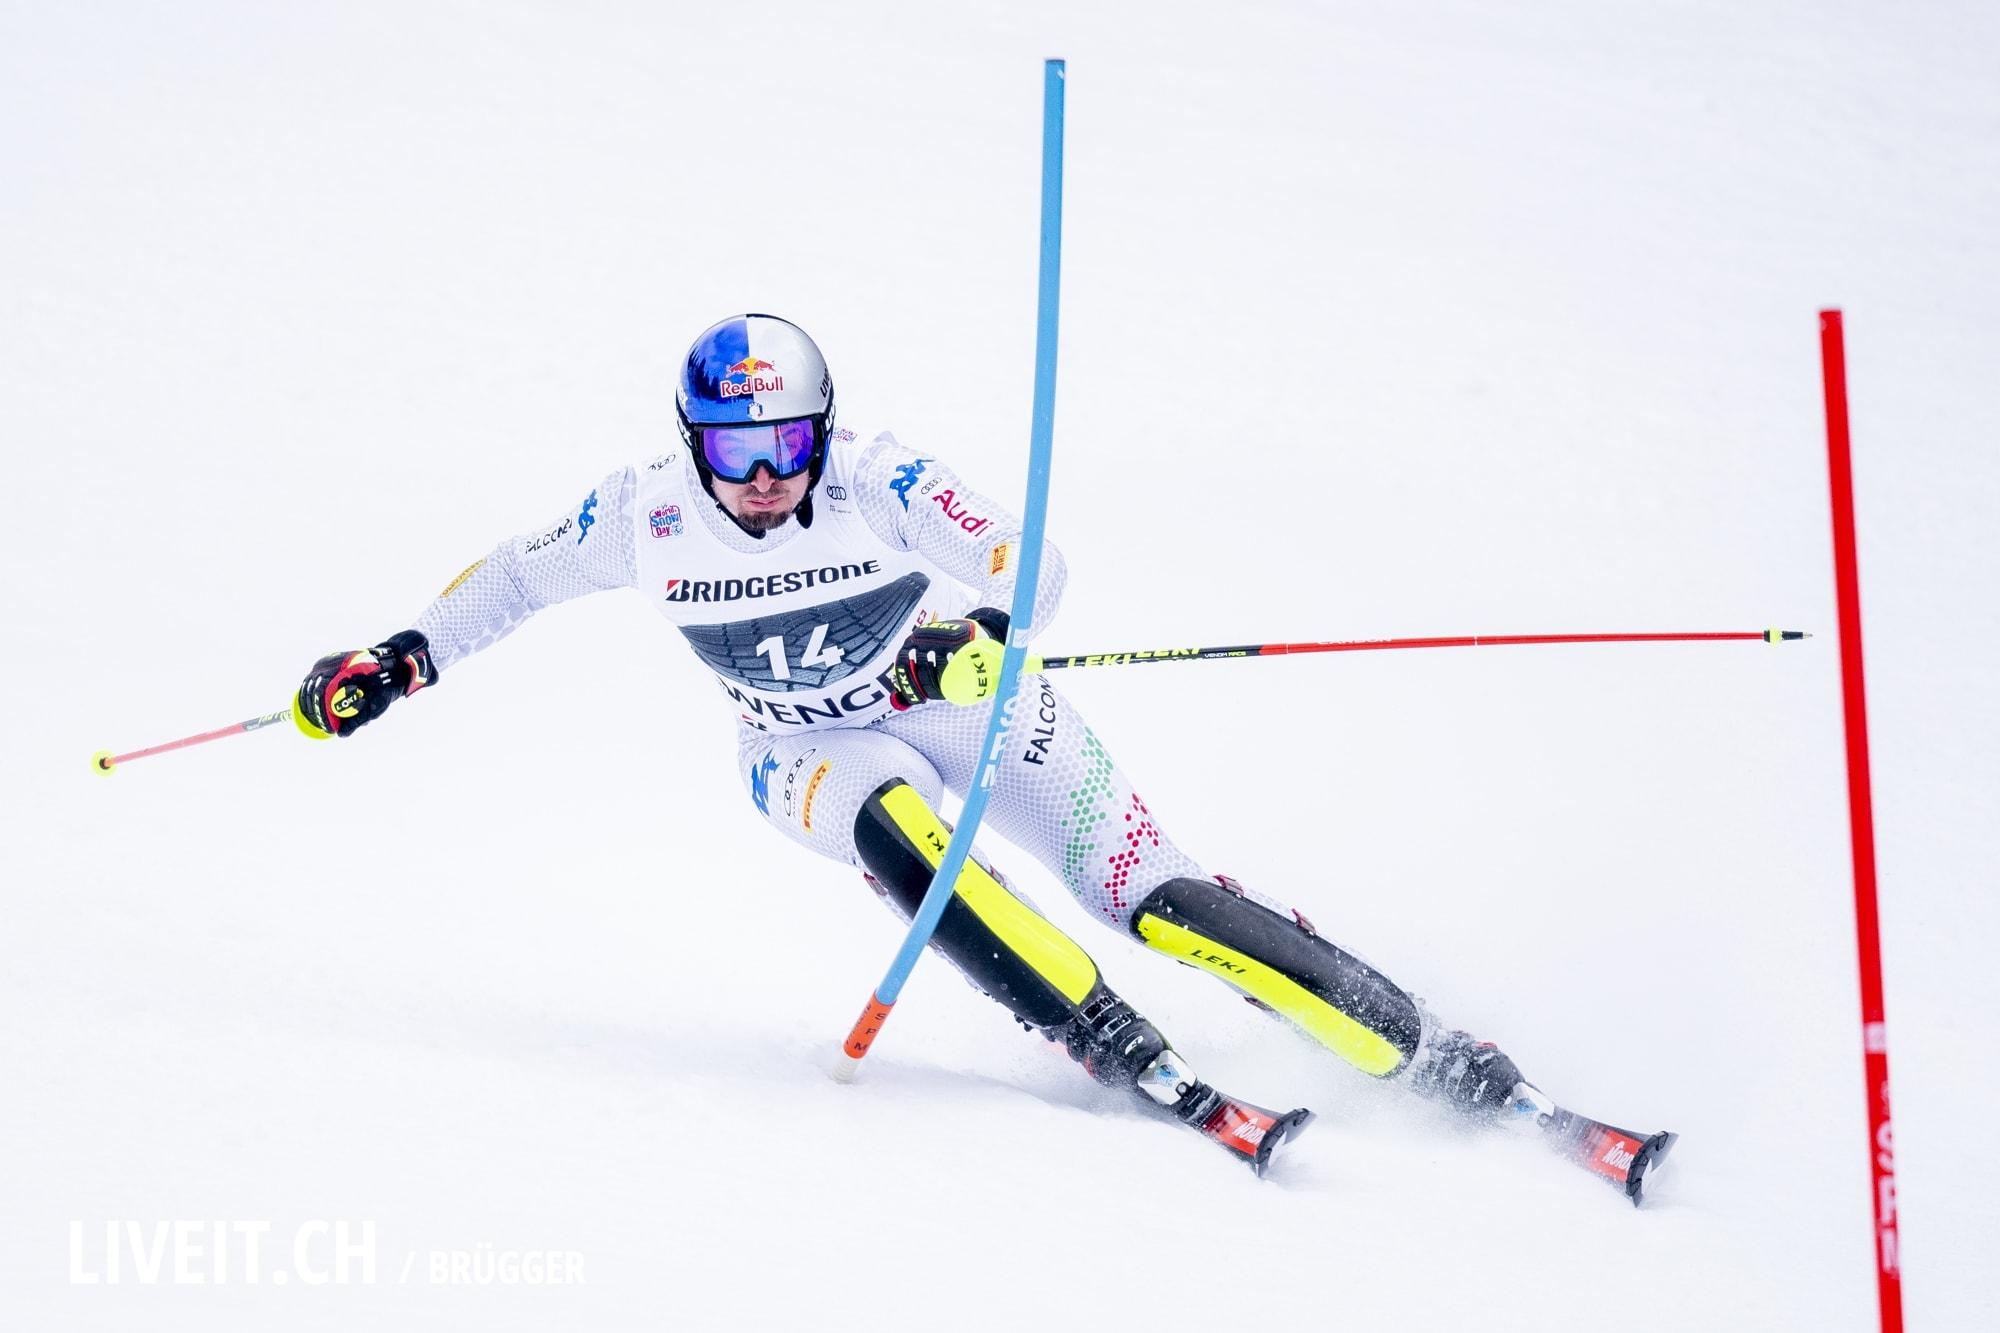 Dominik Paris (ITA) fotografiert am Freitag, 18. Januar 2019 am Lauberhornrennen in der Disziplin: Slalom Alpine Kombination. (Fotografiert von Dominic Bruegger liveit.ch)